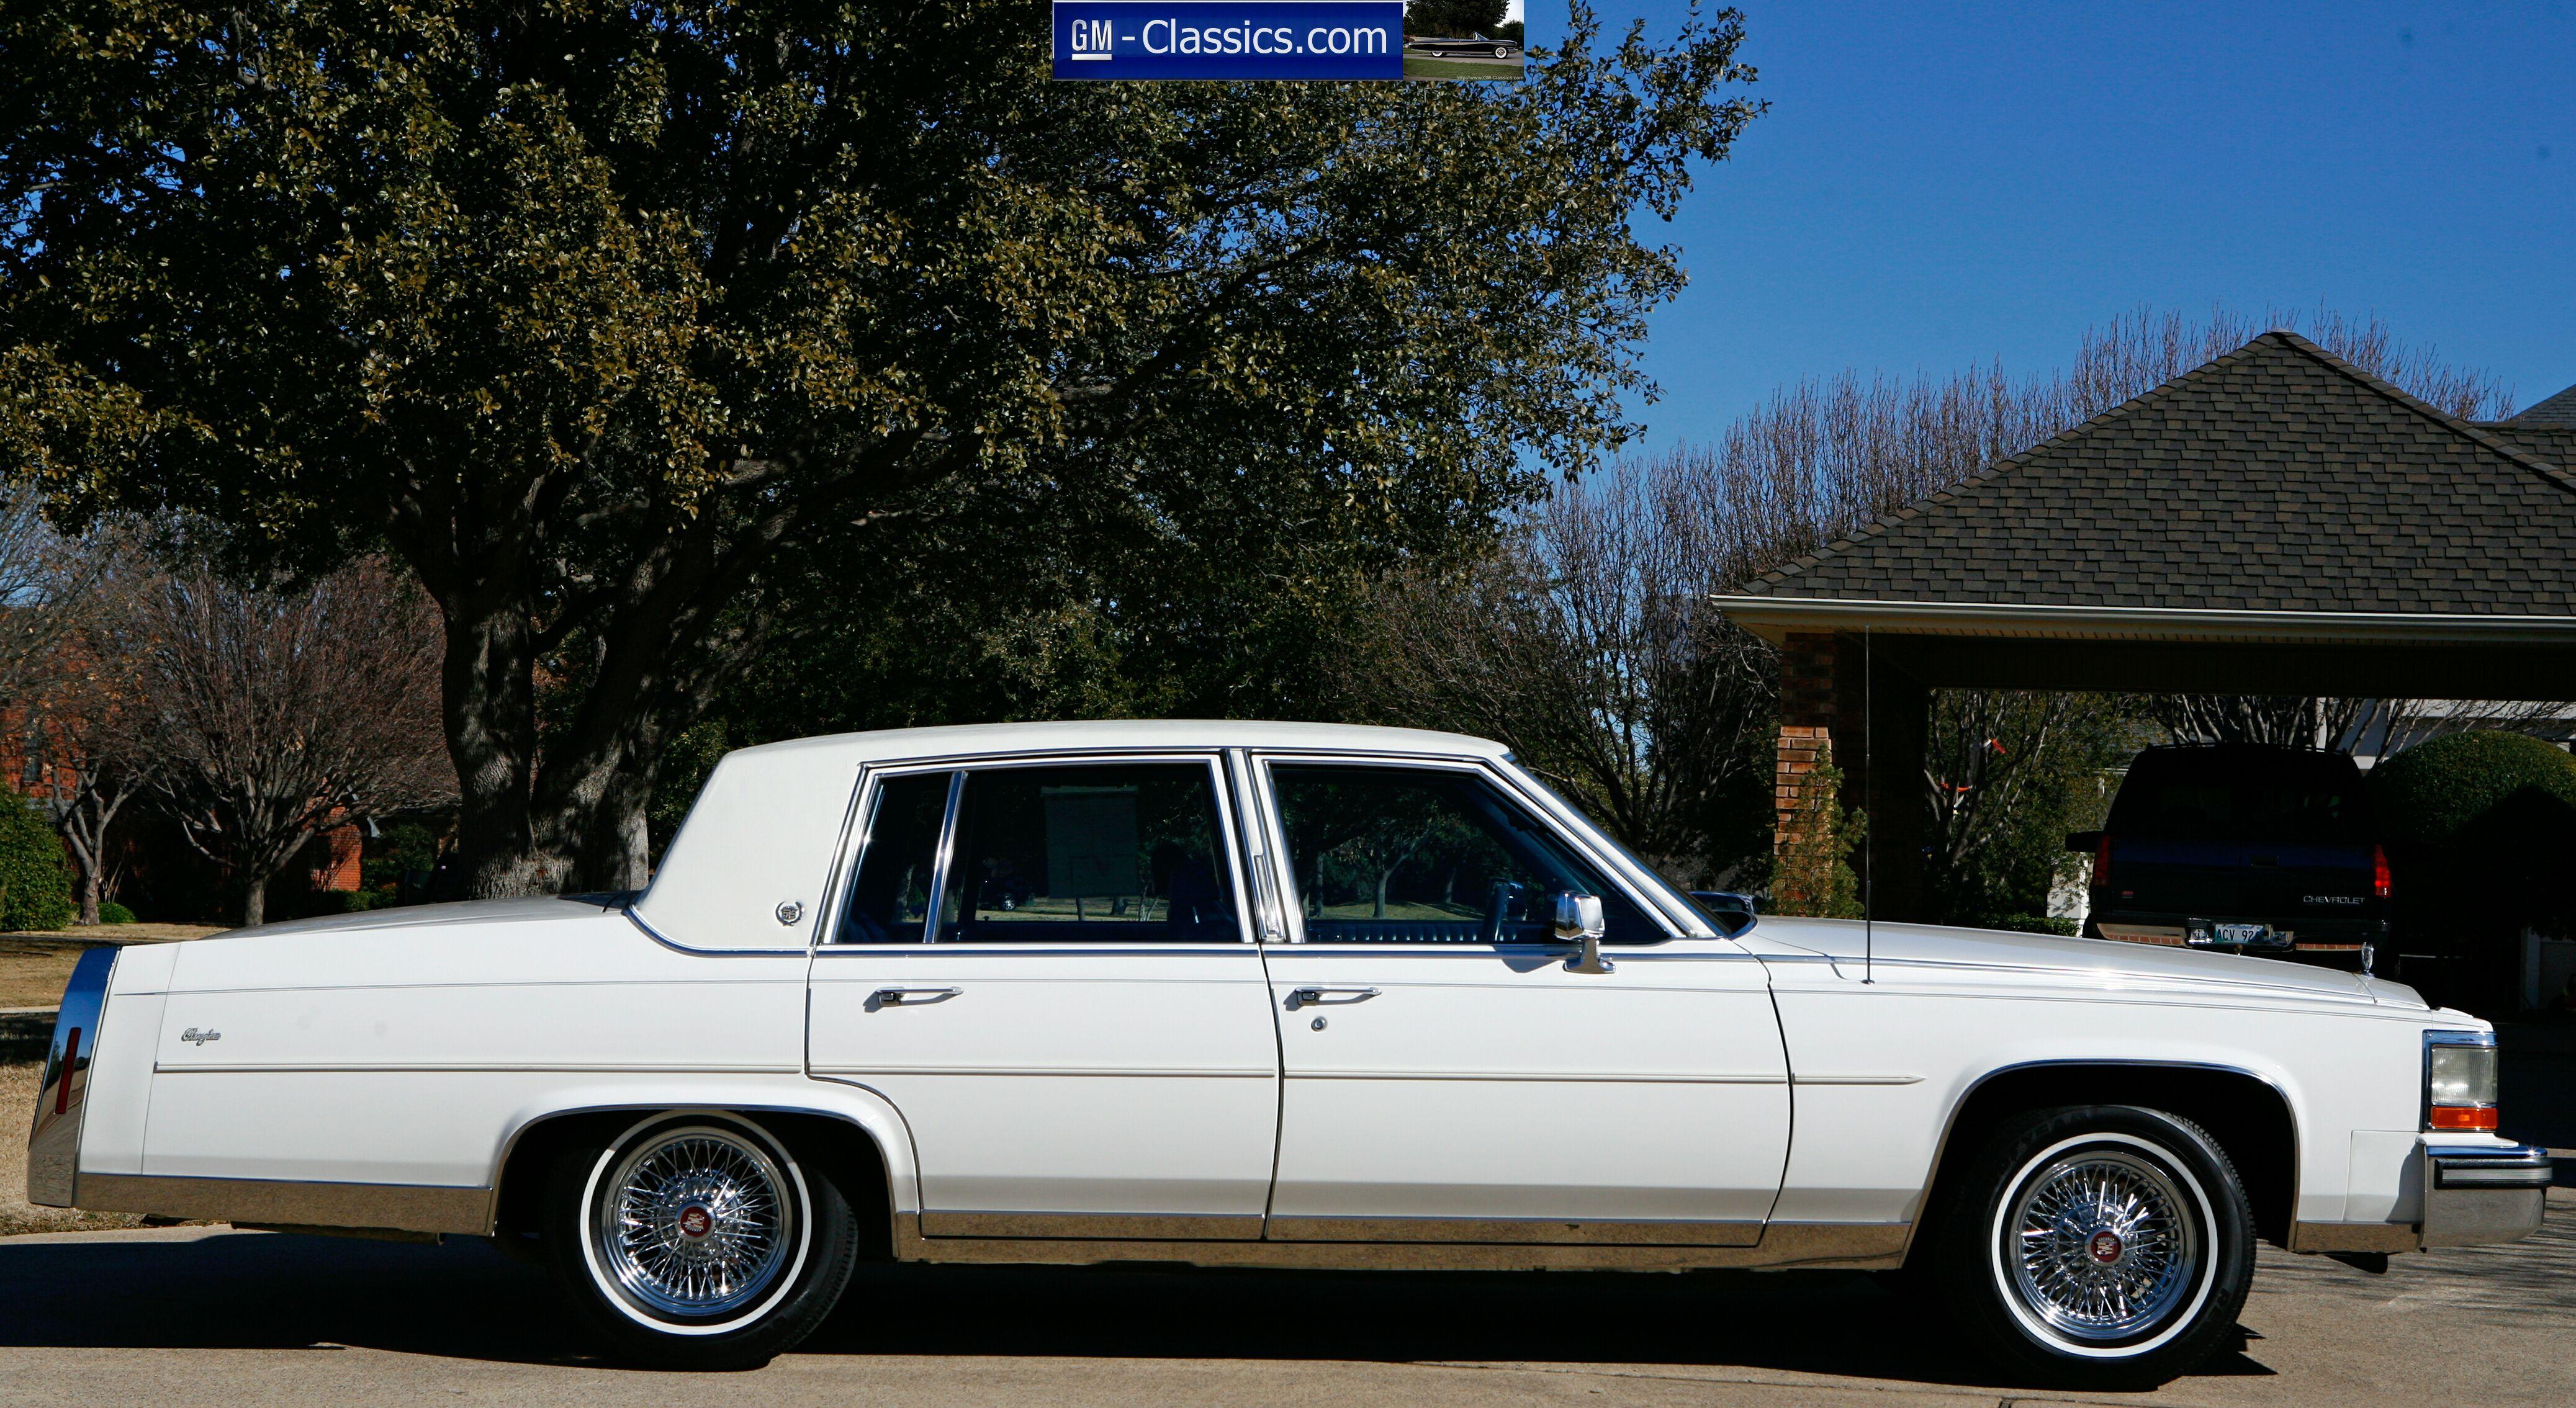 1988 Cadillac Fleetwood Brougham - Matt Garrett